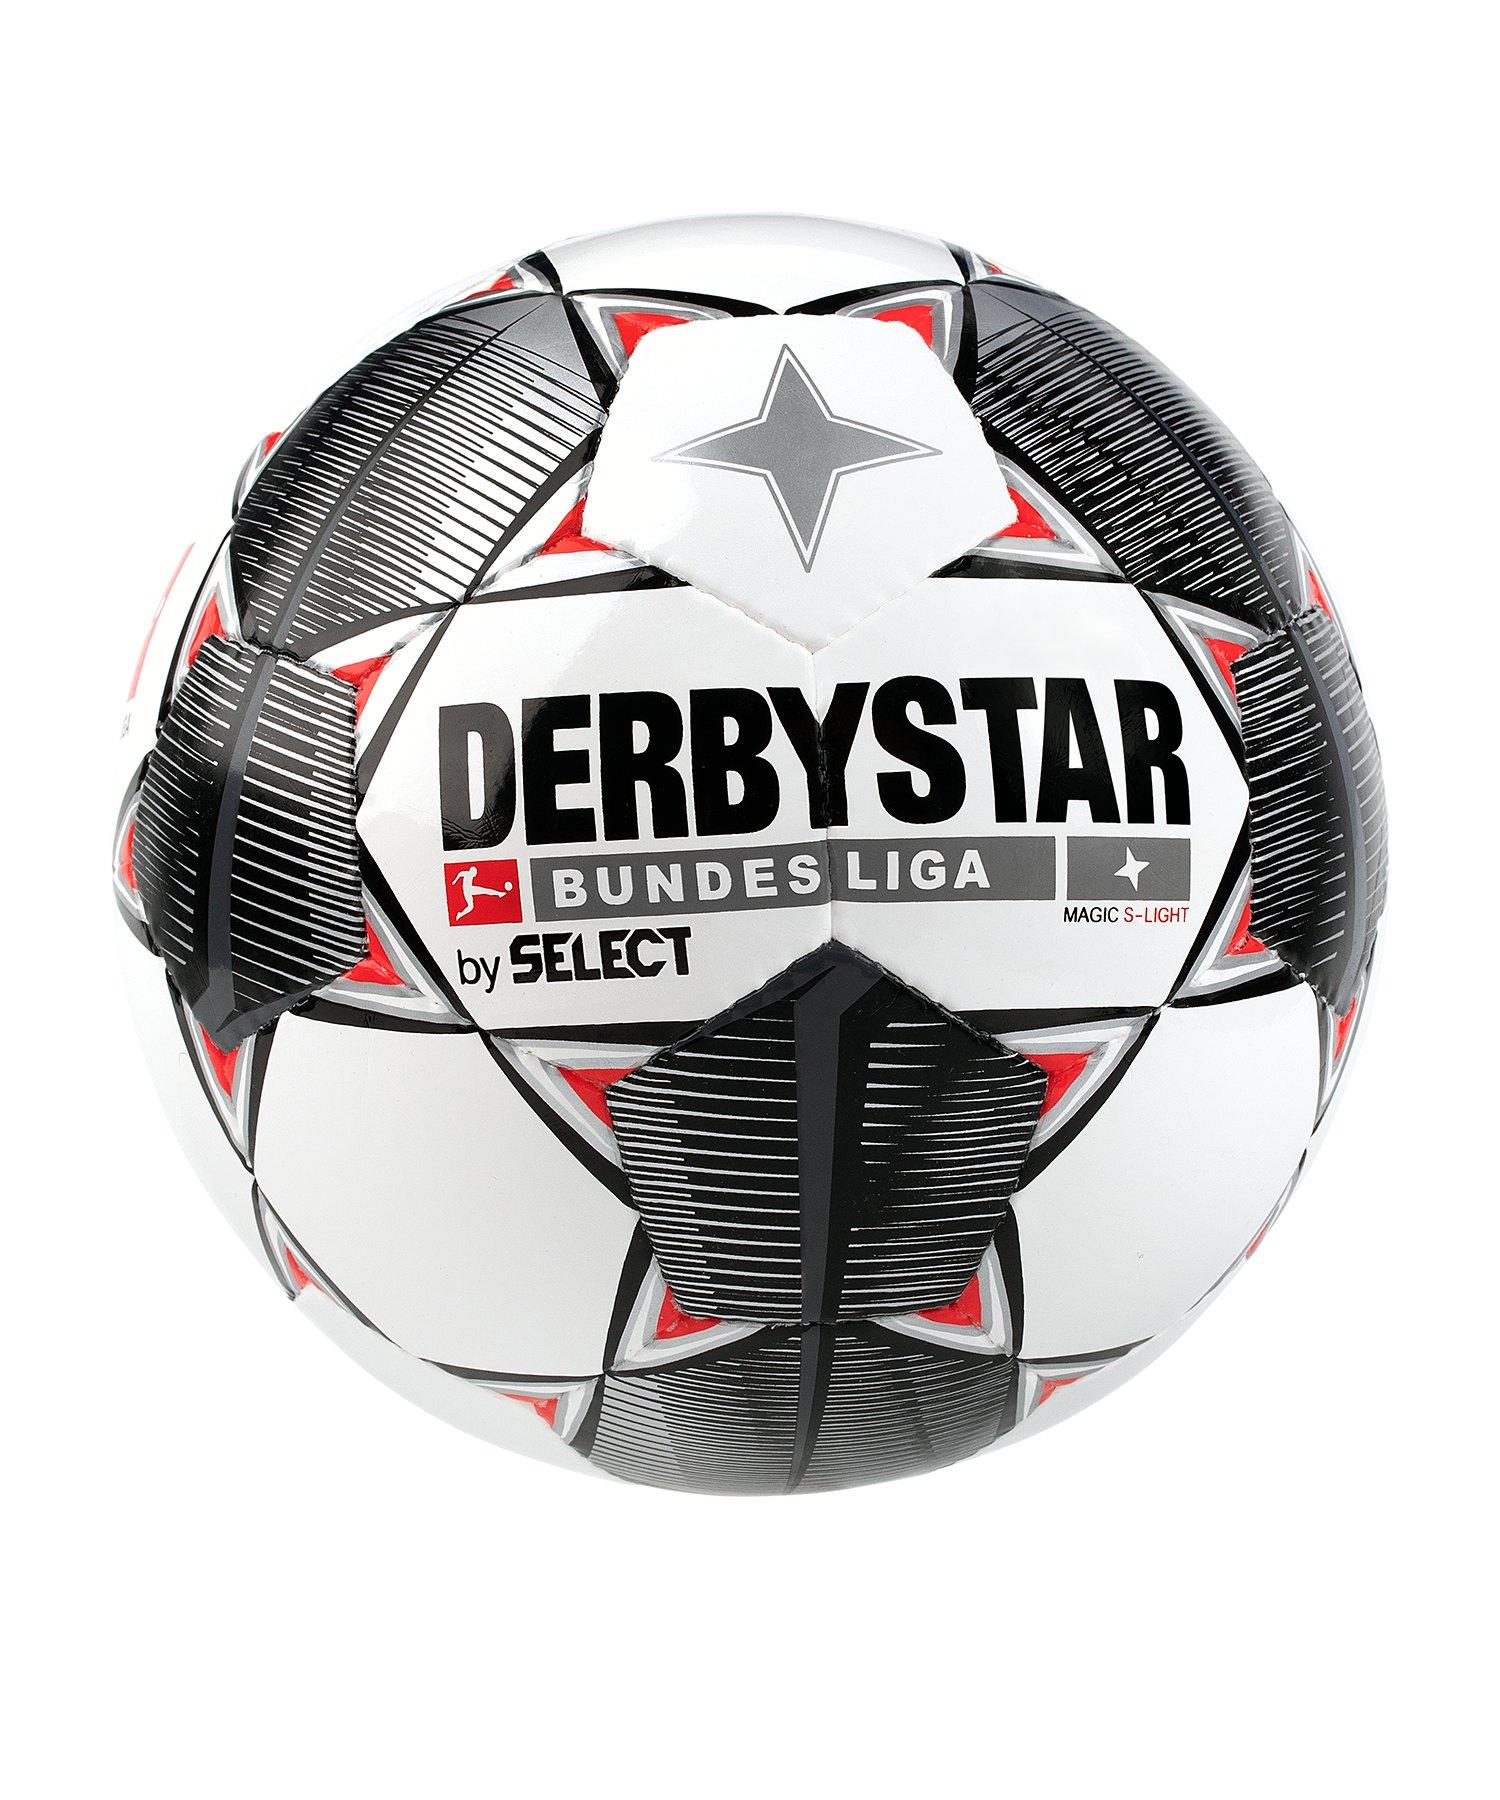 Derbystar Bundesliga Magic S-Light 290 Gramm Weiss F019 - weiss